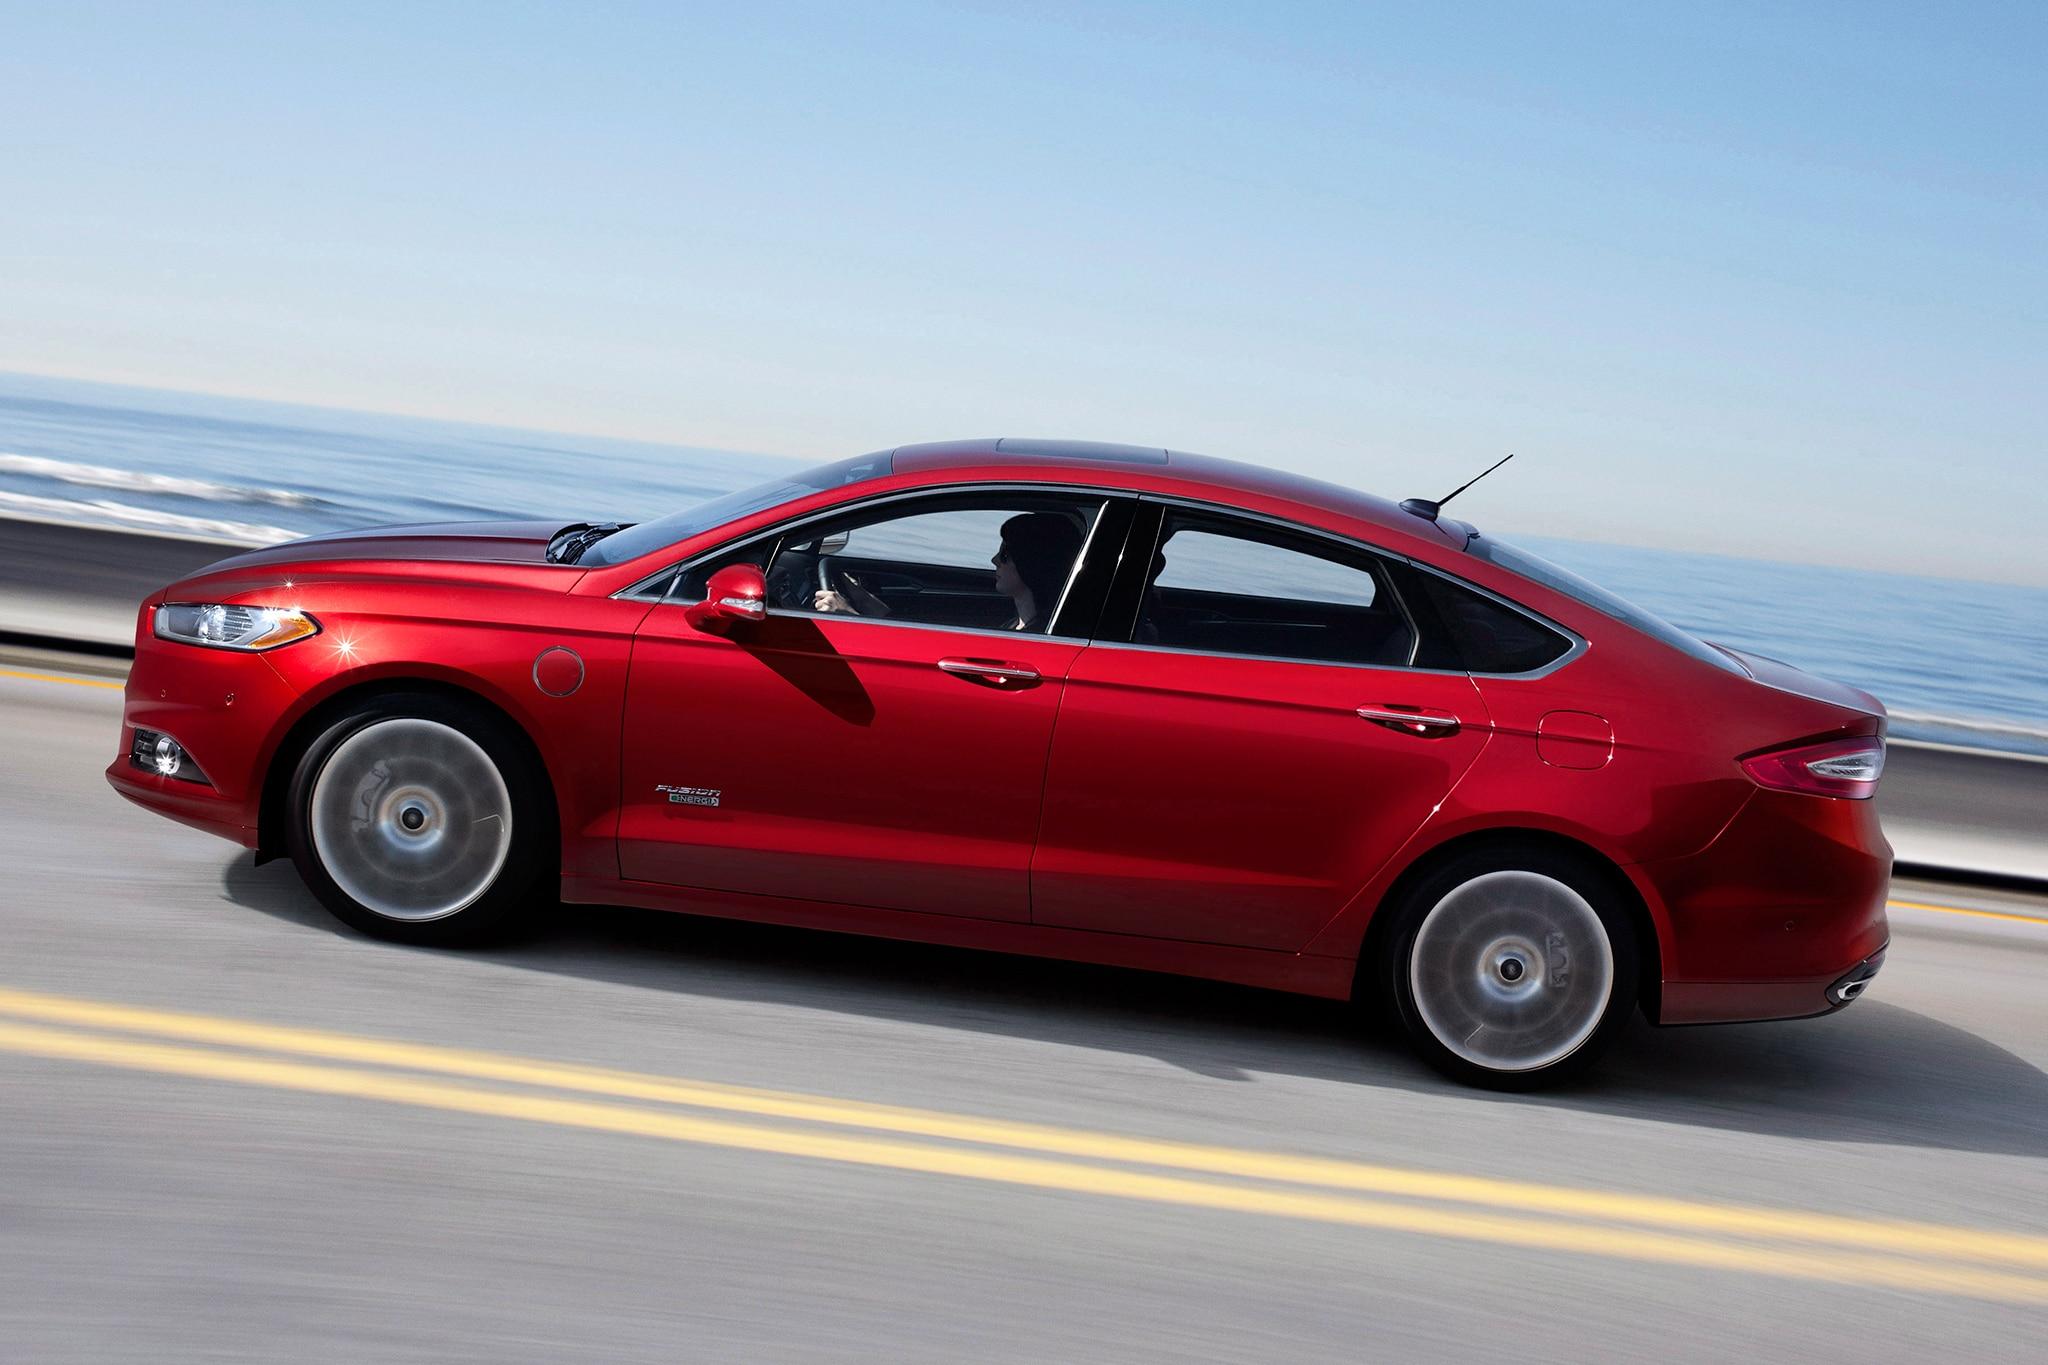 Chrysler Ford Issue Recalls For Supplemental Restraint Module